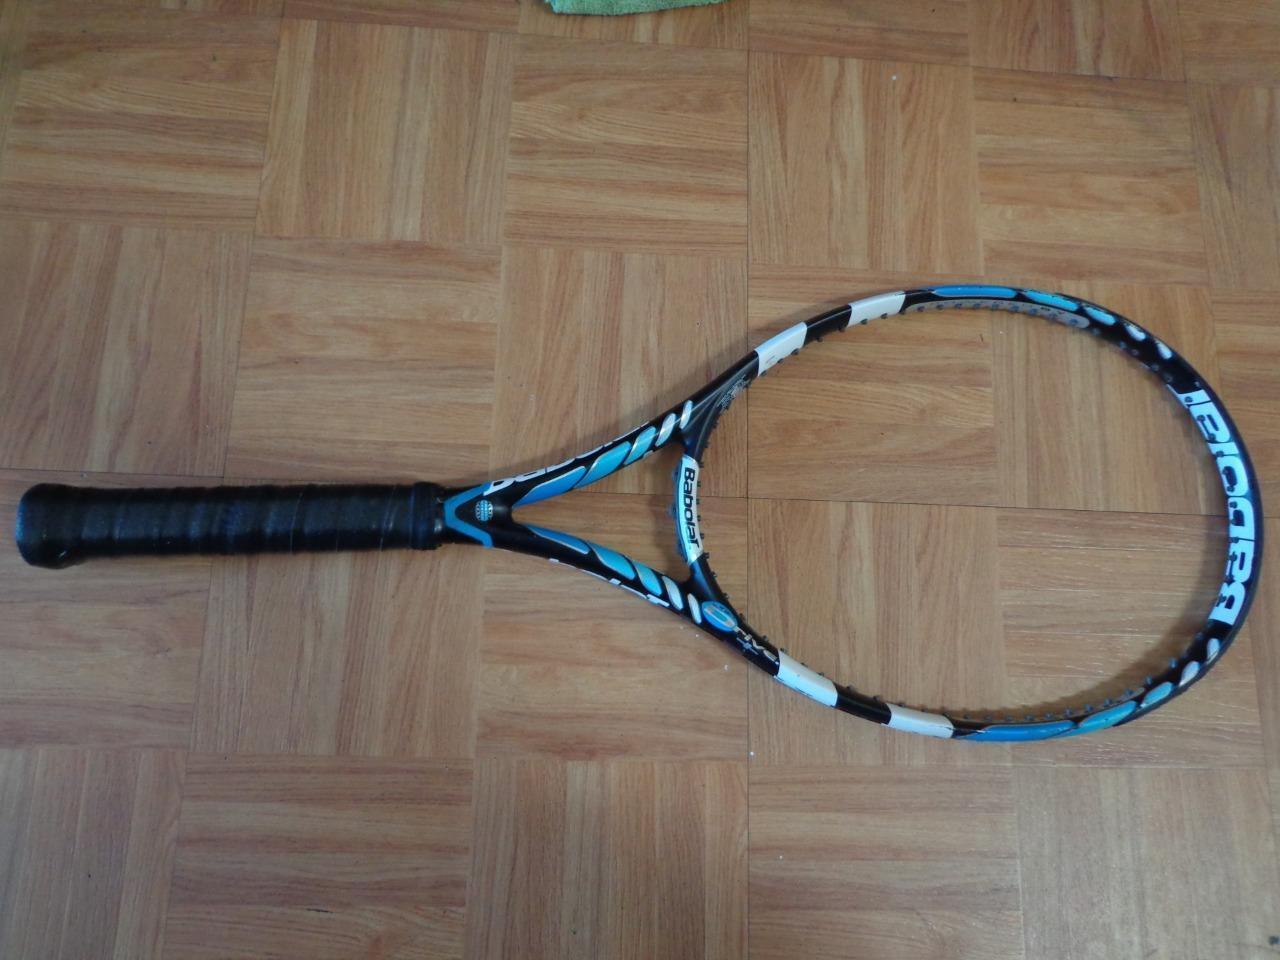 Babolat Pure Drive Plus 27.5 Cortex 100 cabeza 10.6oz 4 1 4 Grip Tenis Raqueta